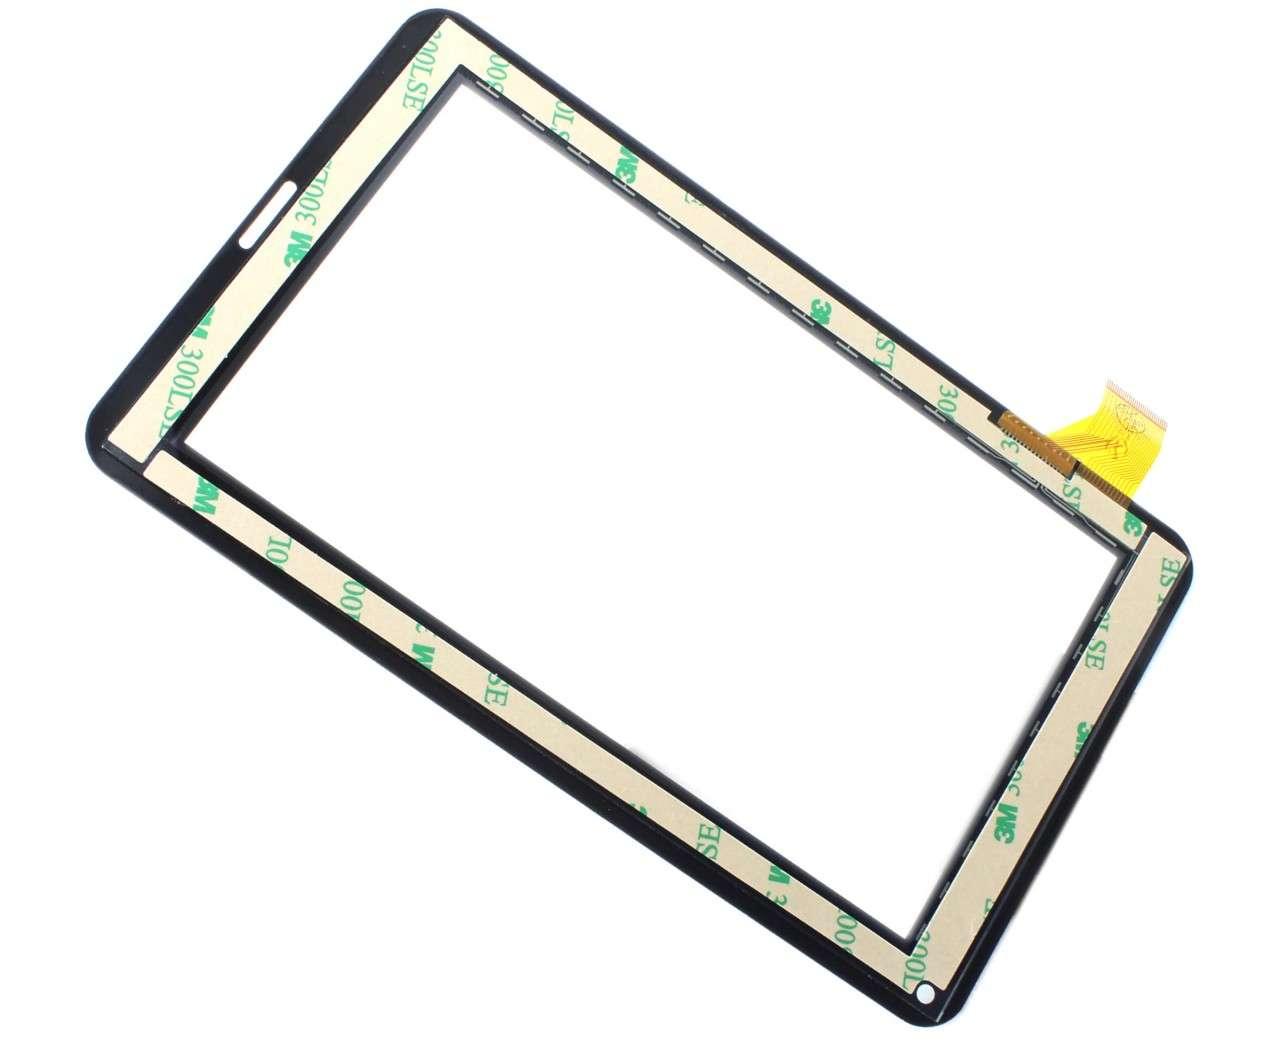 Touchscreen Digitizer Quicktab Q721 Geam Sticla Tableta imagine powerlaptop.ro 2021